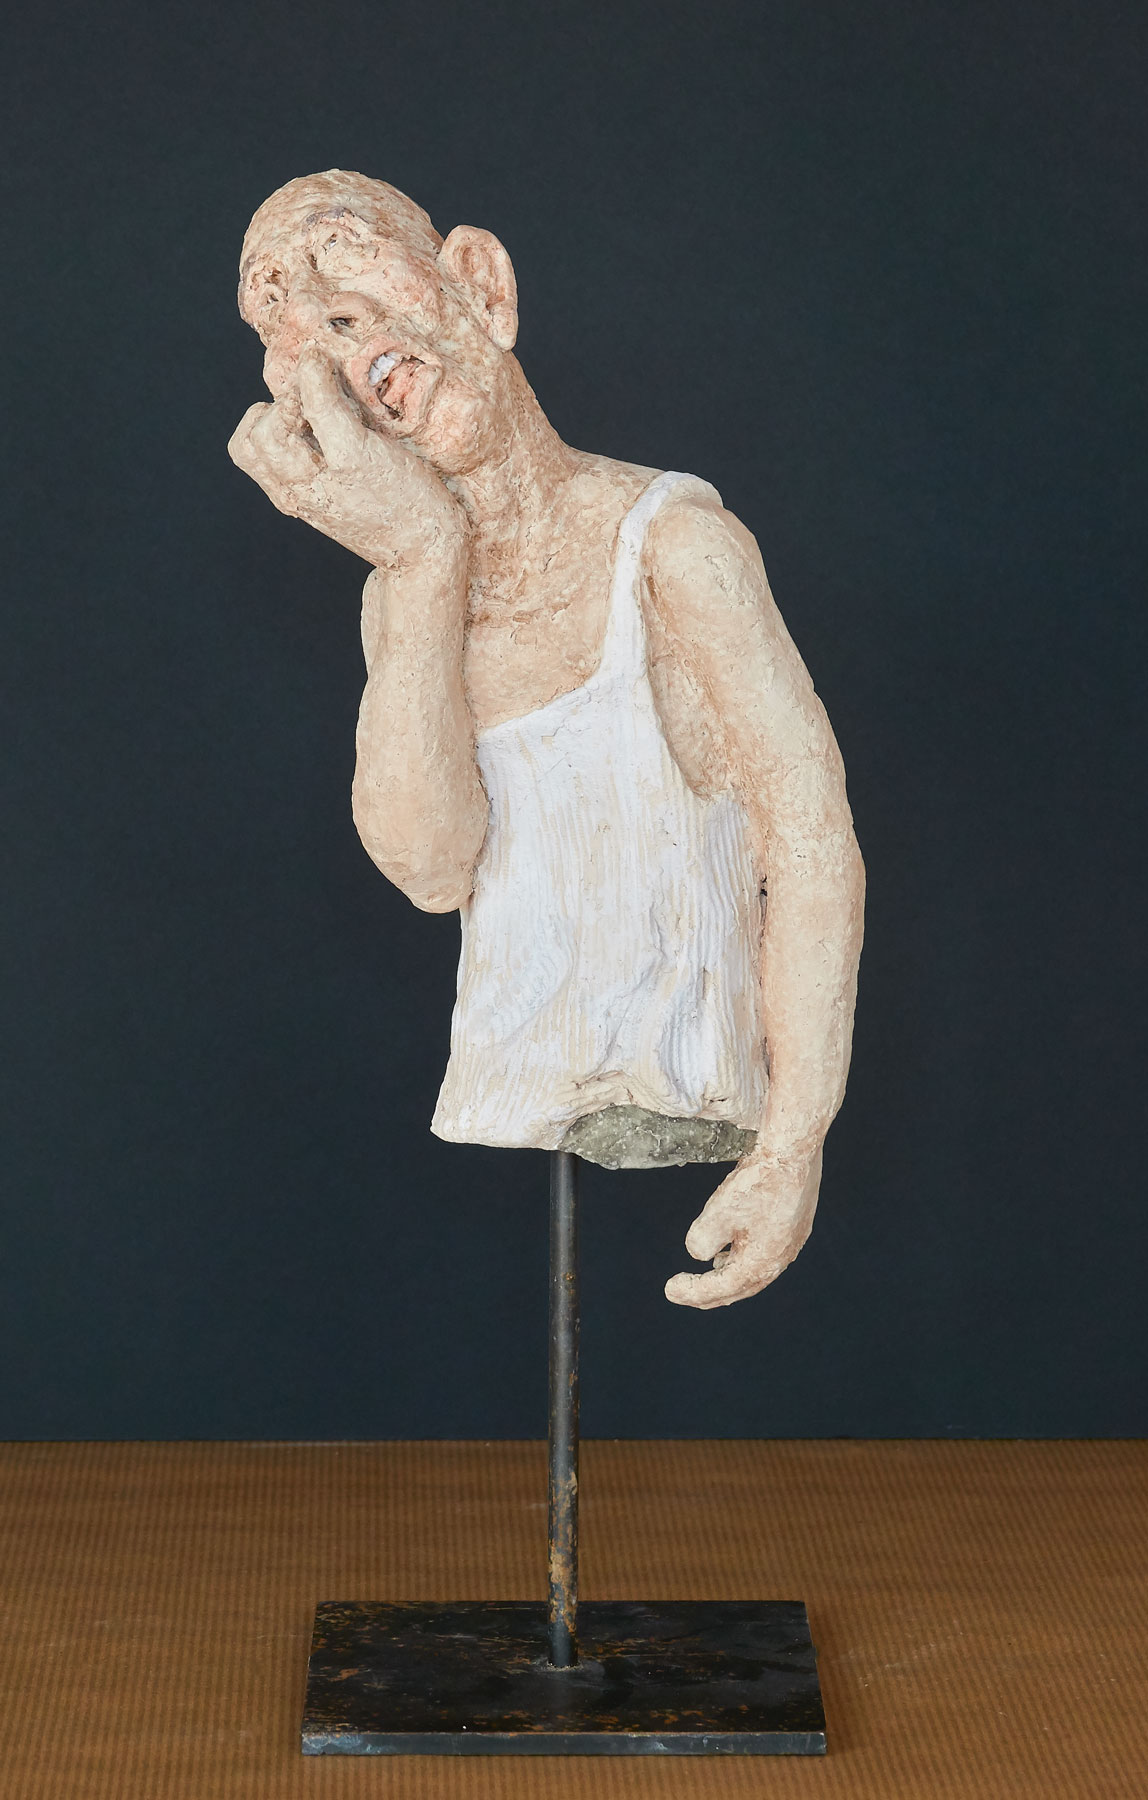 Sculpture Der Popler, Ton, 2018